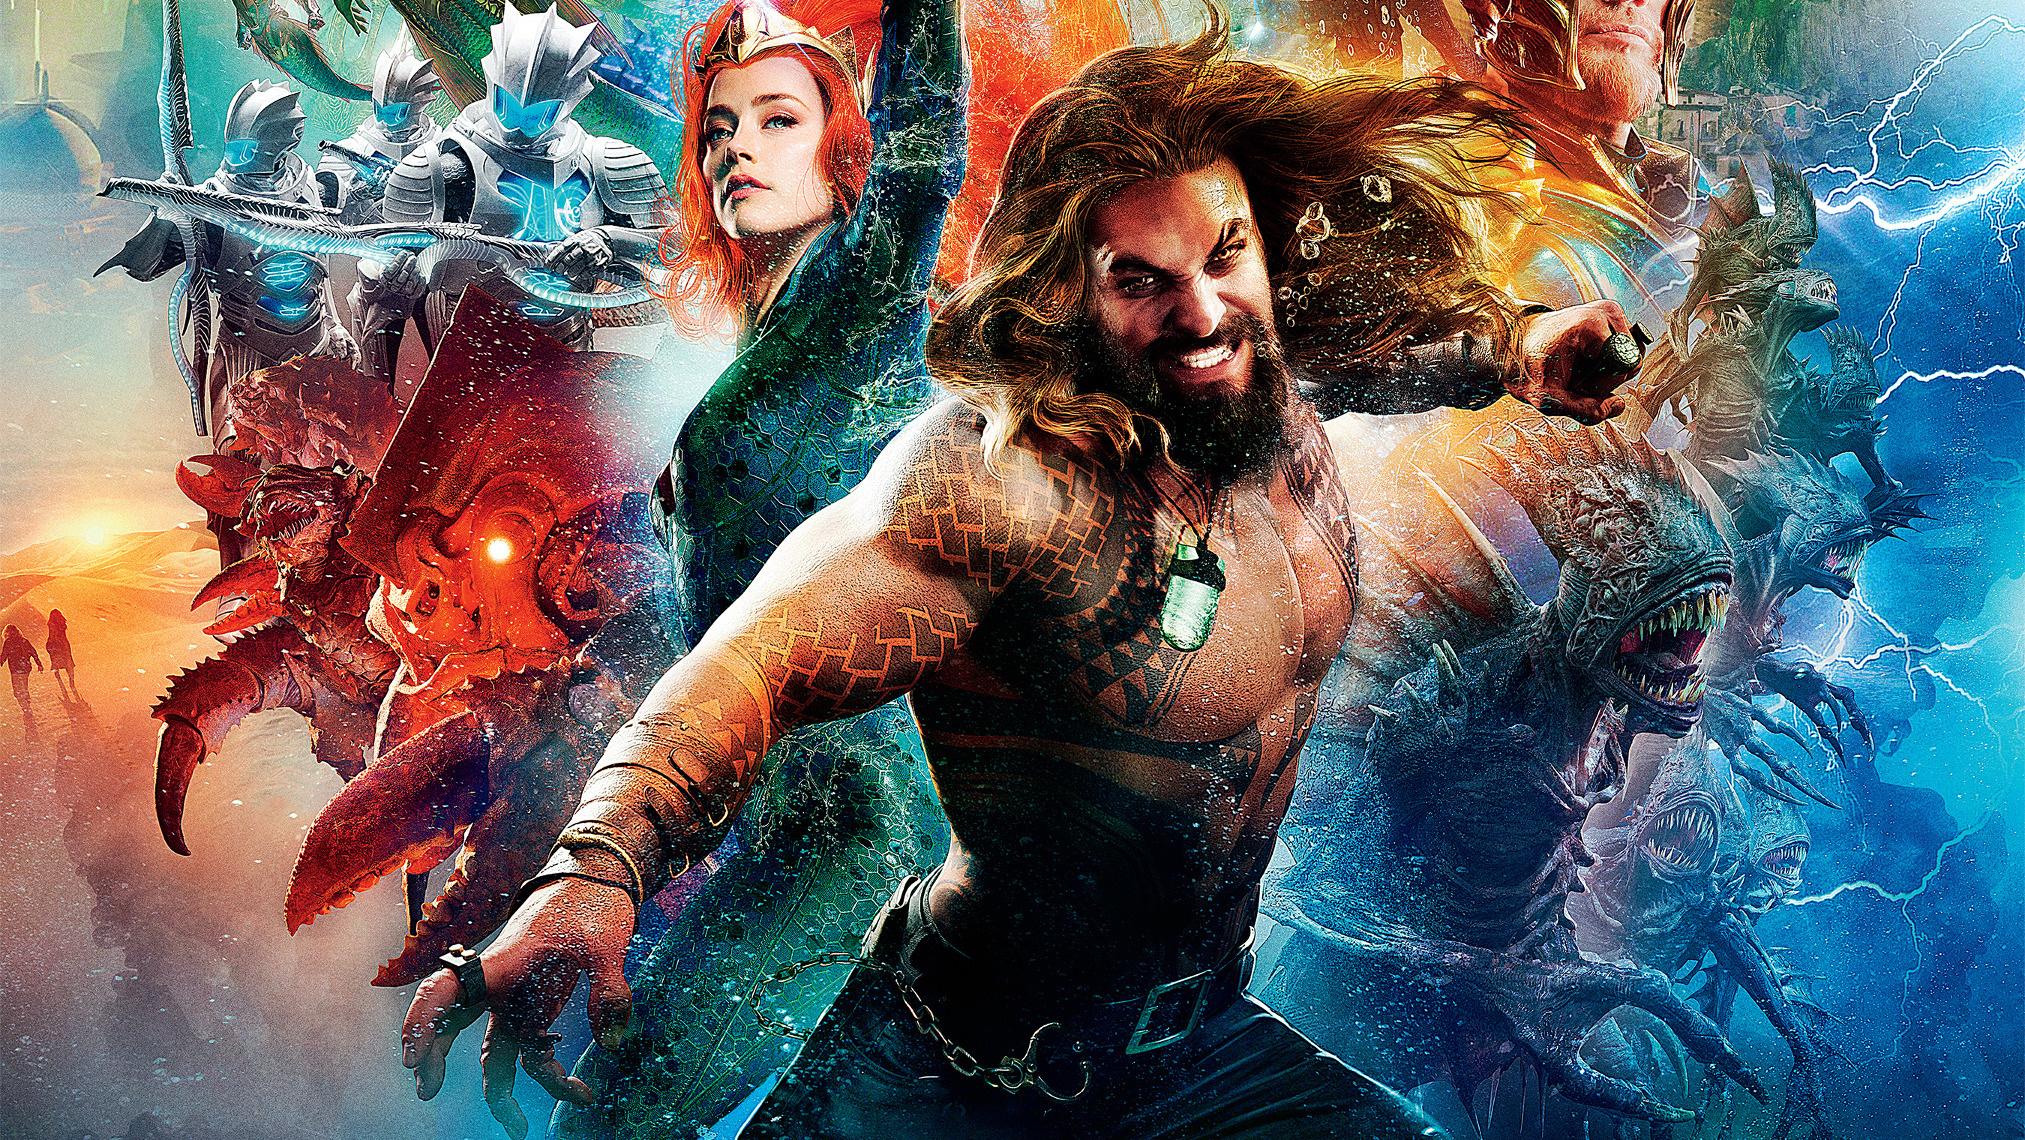 Aquaman Movie Free Download In Hindi In 1080: Aquaman 2018 Movie, HD Movies, 4k Wallpapers, Images